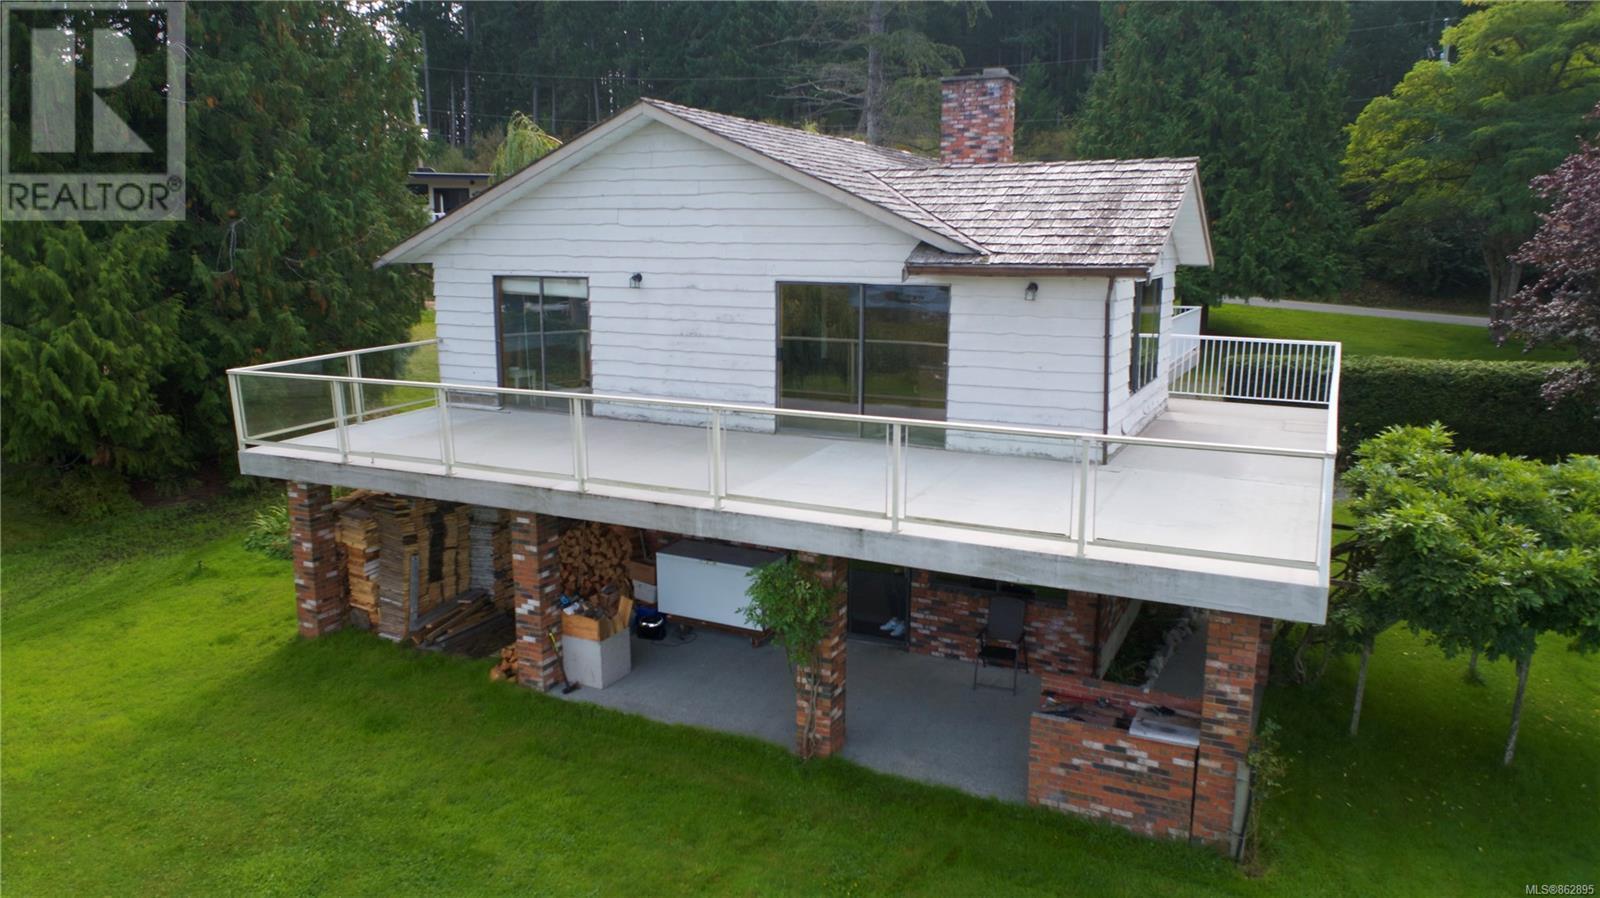 6690 Jenkins Rd, Nanaimo, British Columbia  V9T 6G8 - Photo 37 - 862895